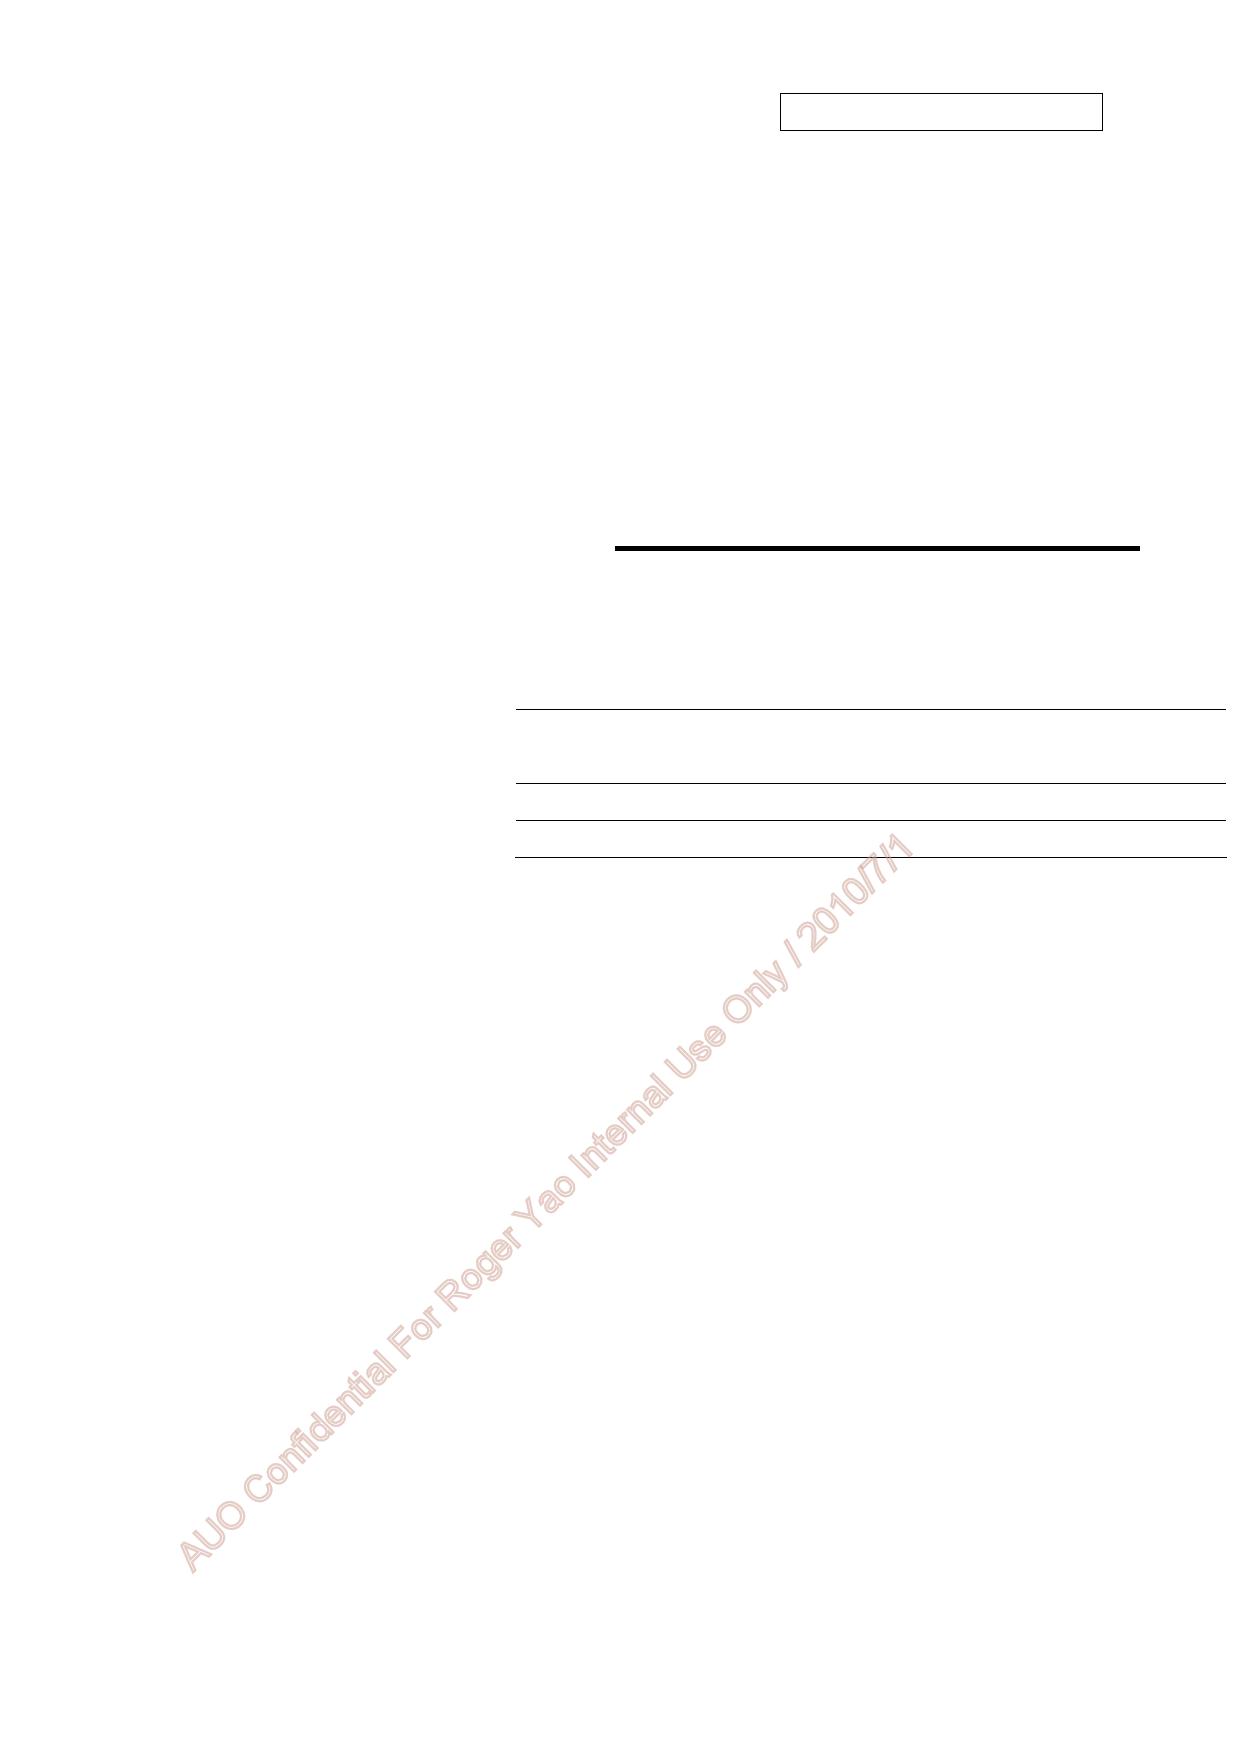 A070VW08-V0 pdf, schematic